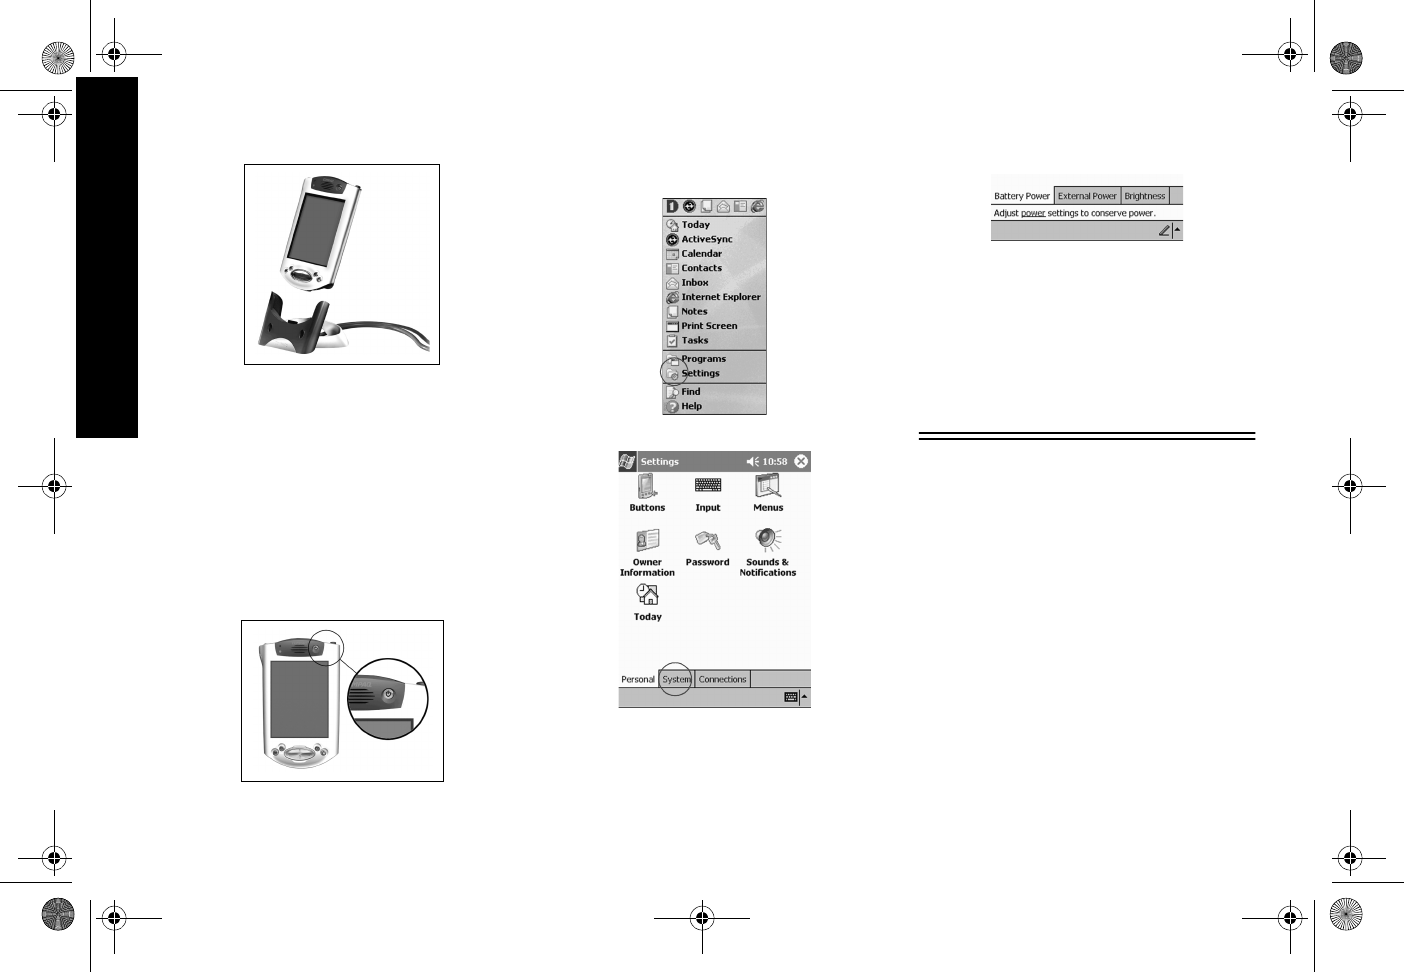 Hp Hewlett Packard Ipaq H3900 Series Getting Started Guide